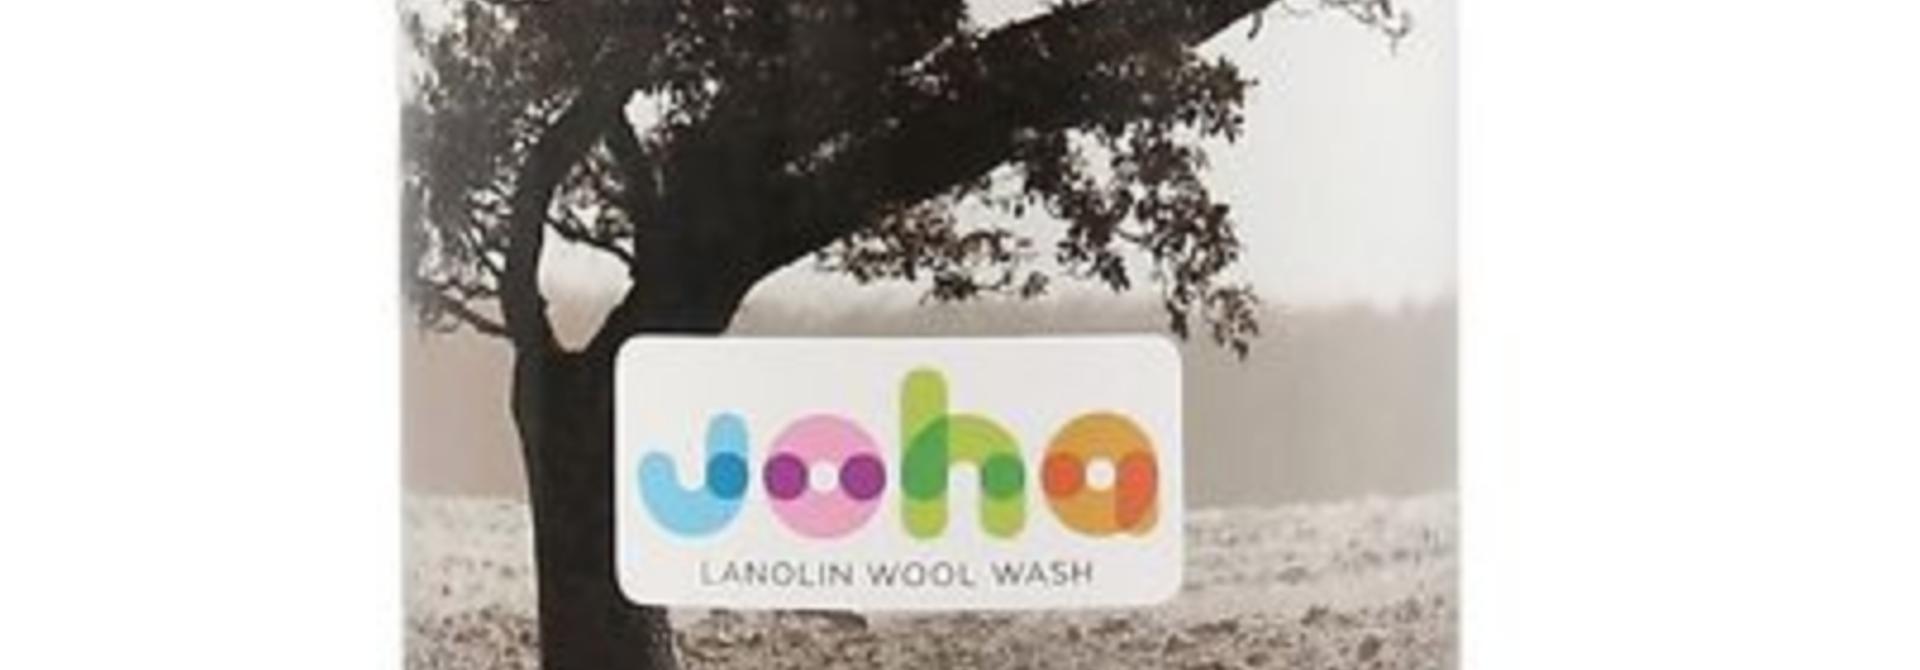 Lanolin wool-wash - 500ml